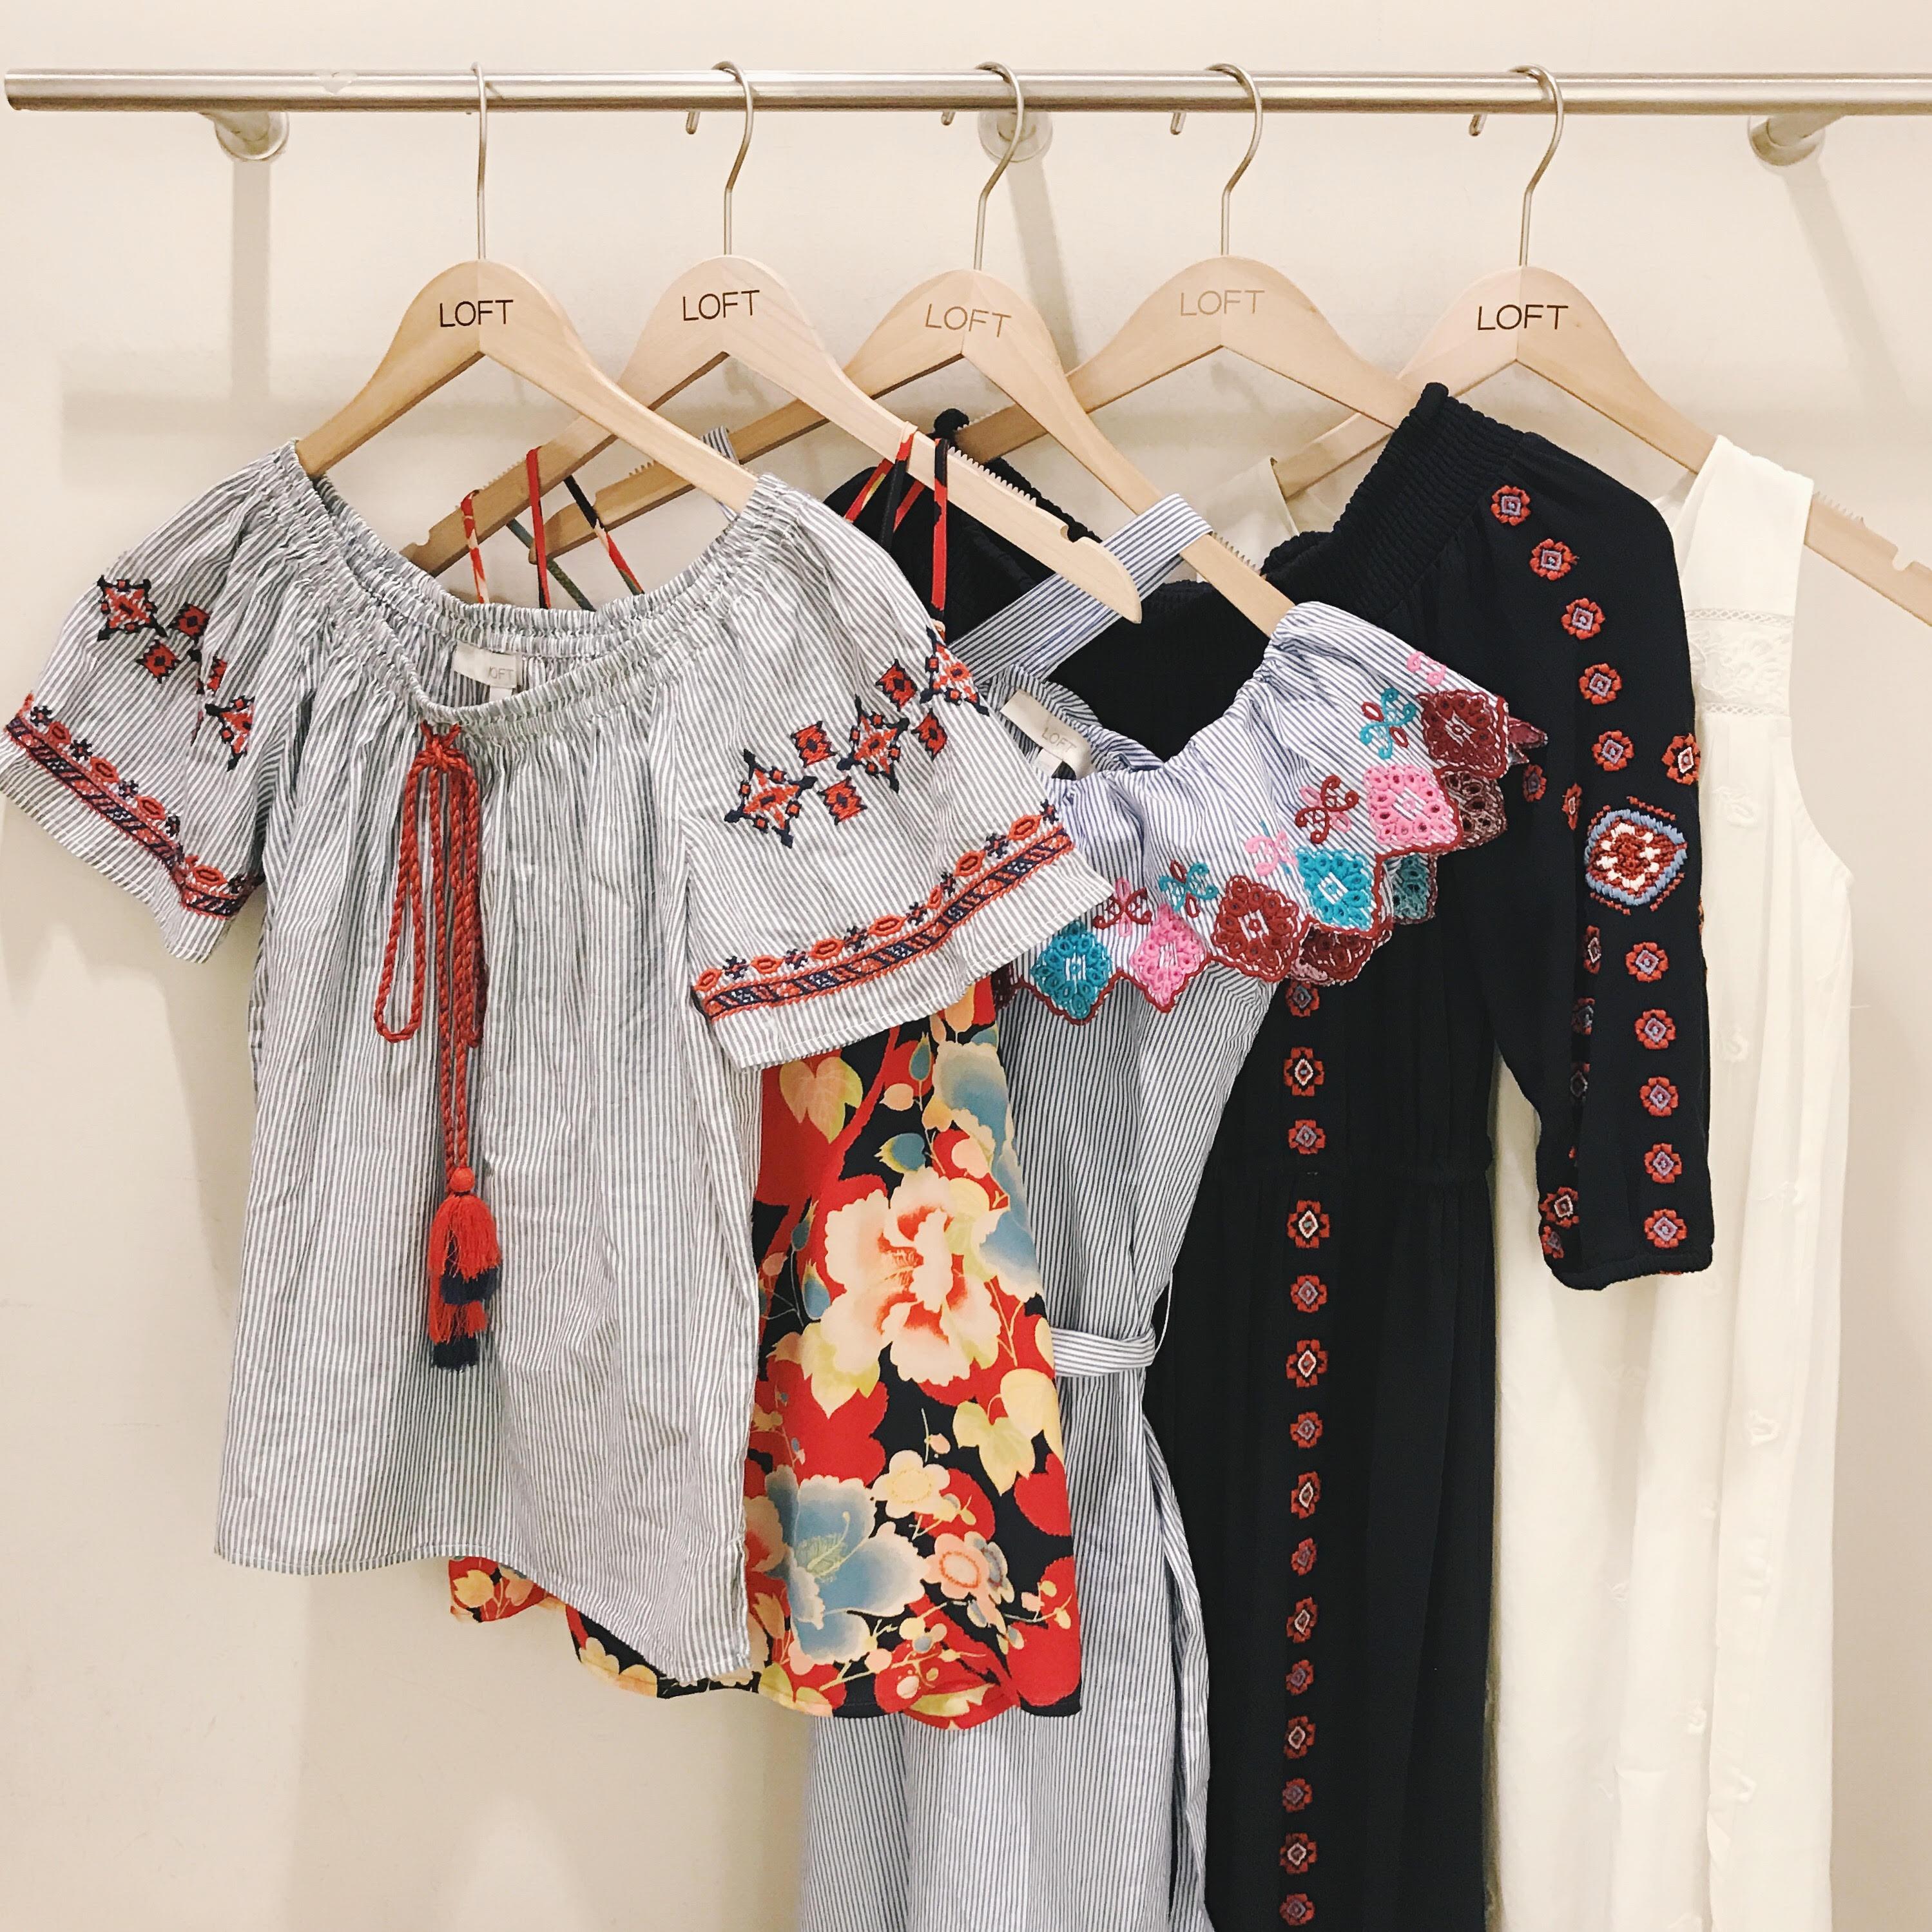 Fitting Room Try On / LOFT Summer 2017